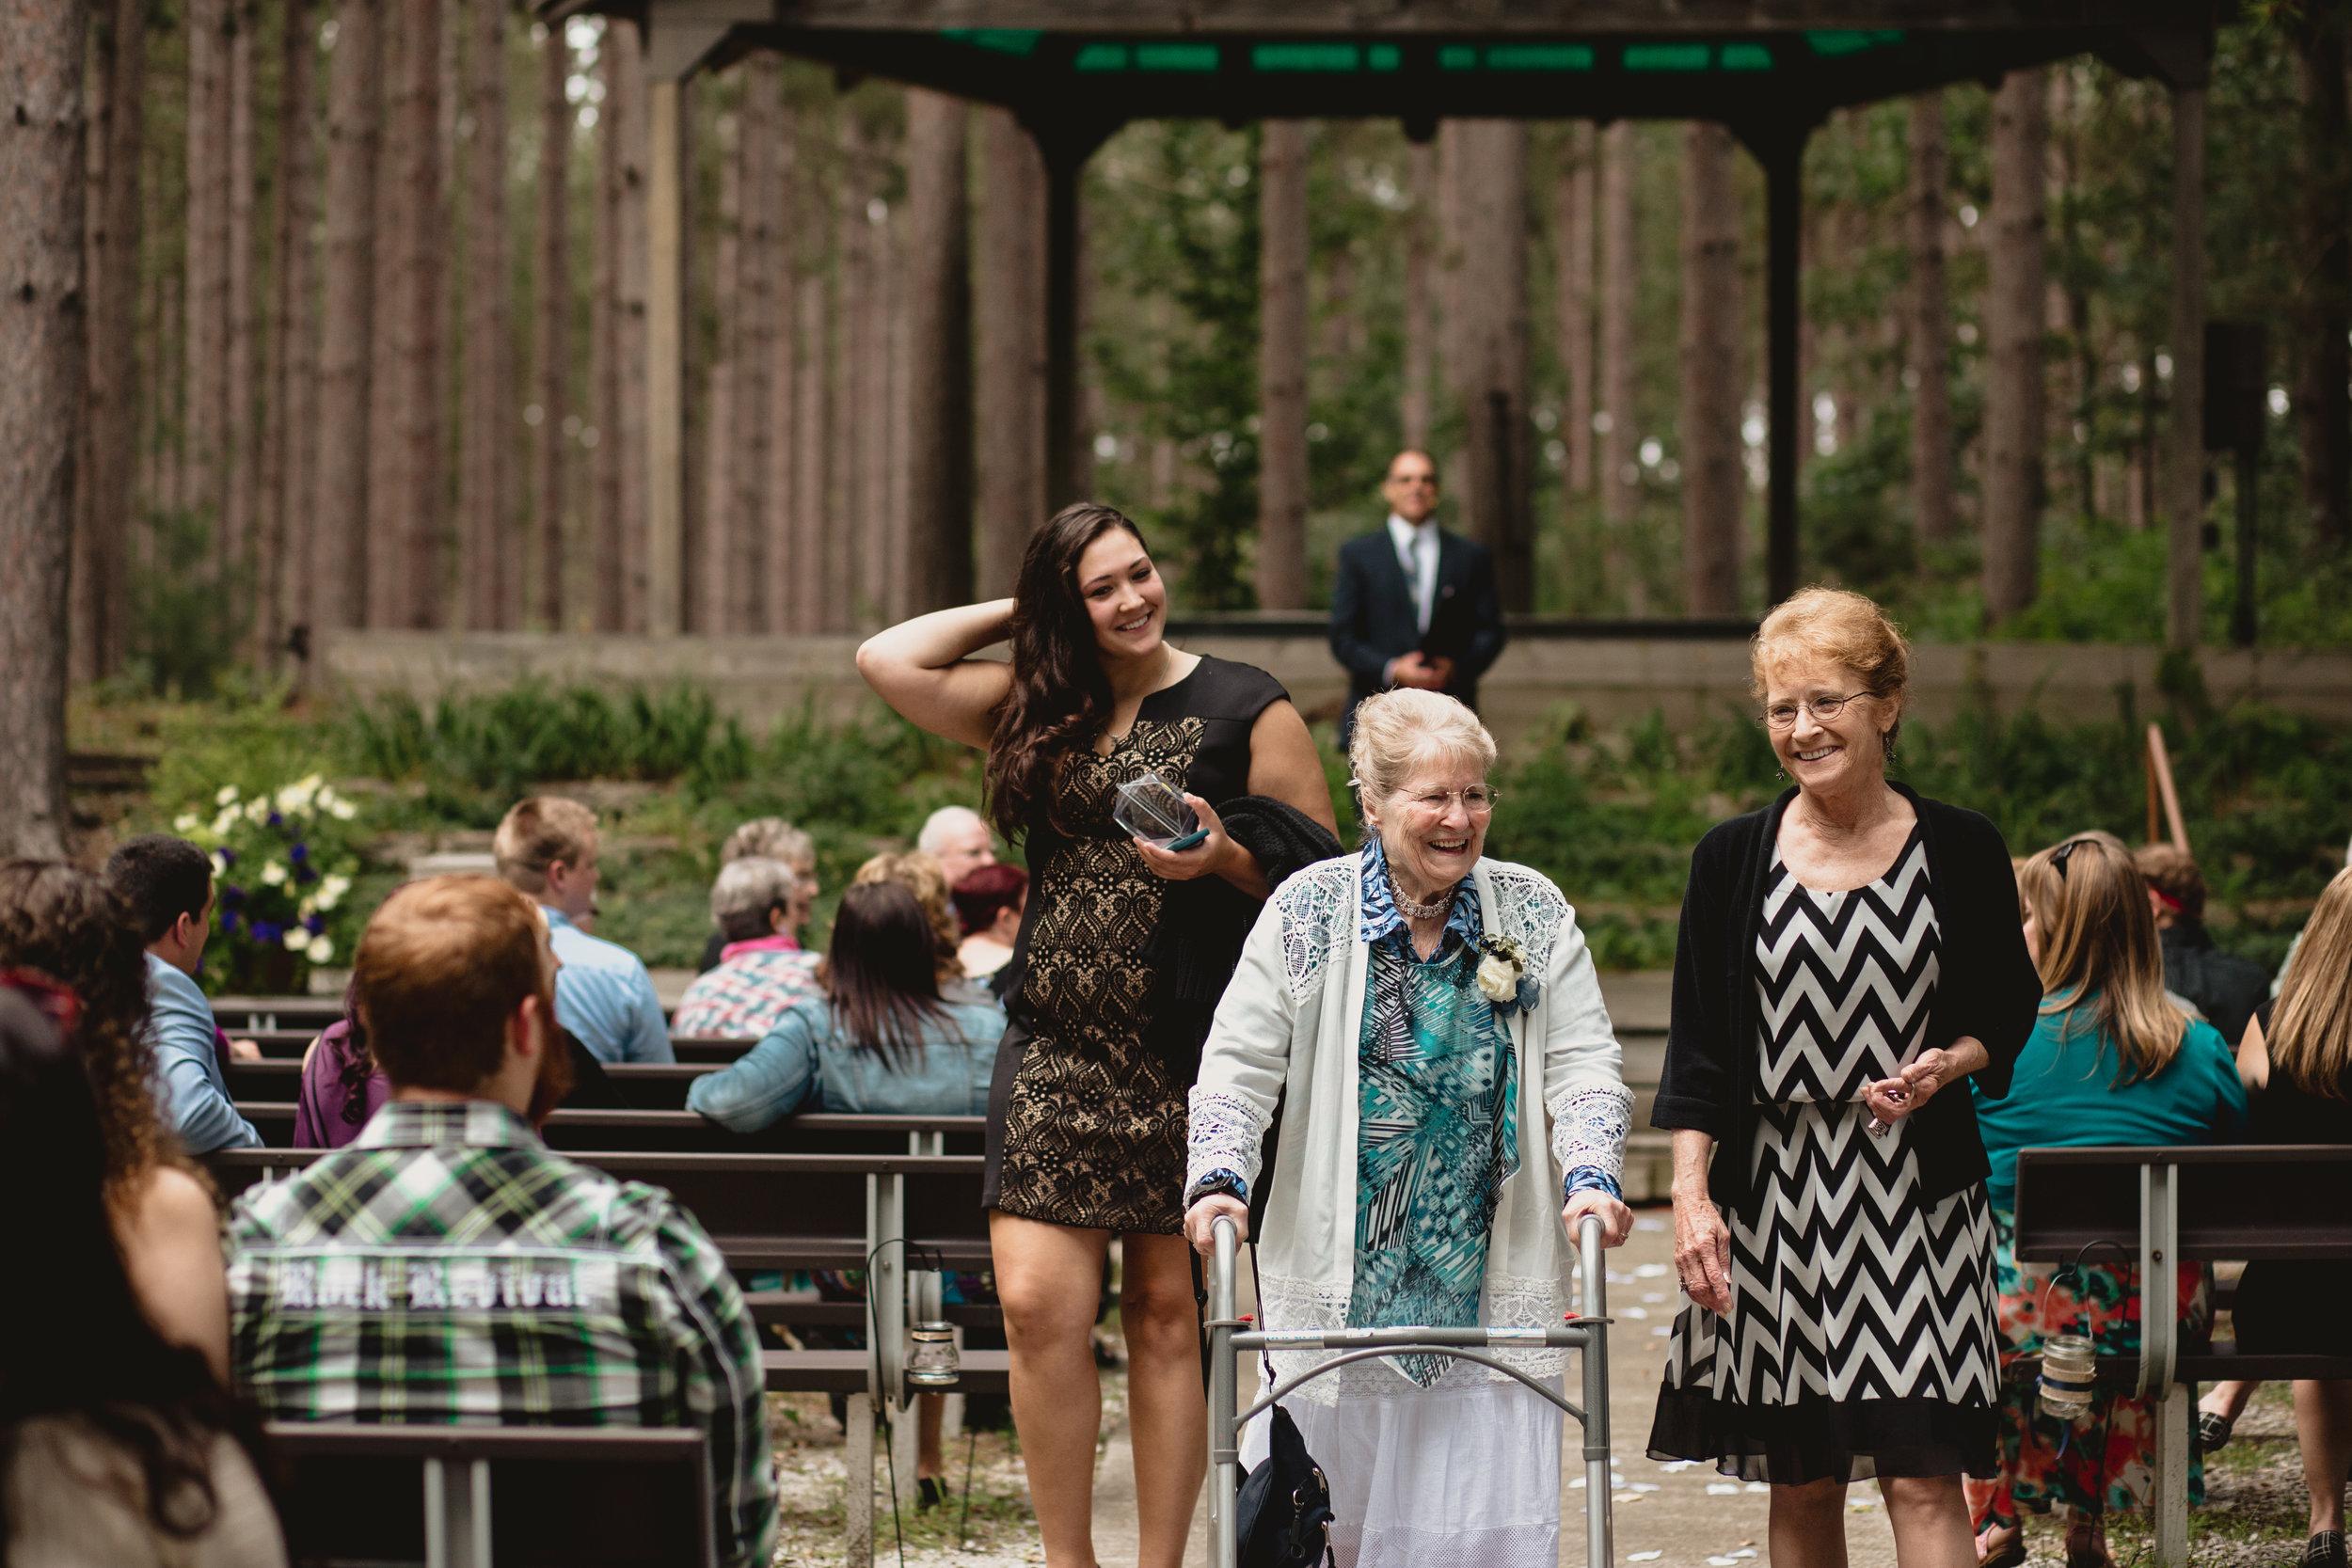 west-michigan-wedding-photographer-whitehall-rachel-austin-chapel-in-the-pines-314.jpg